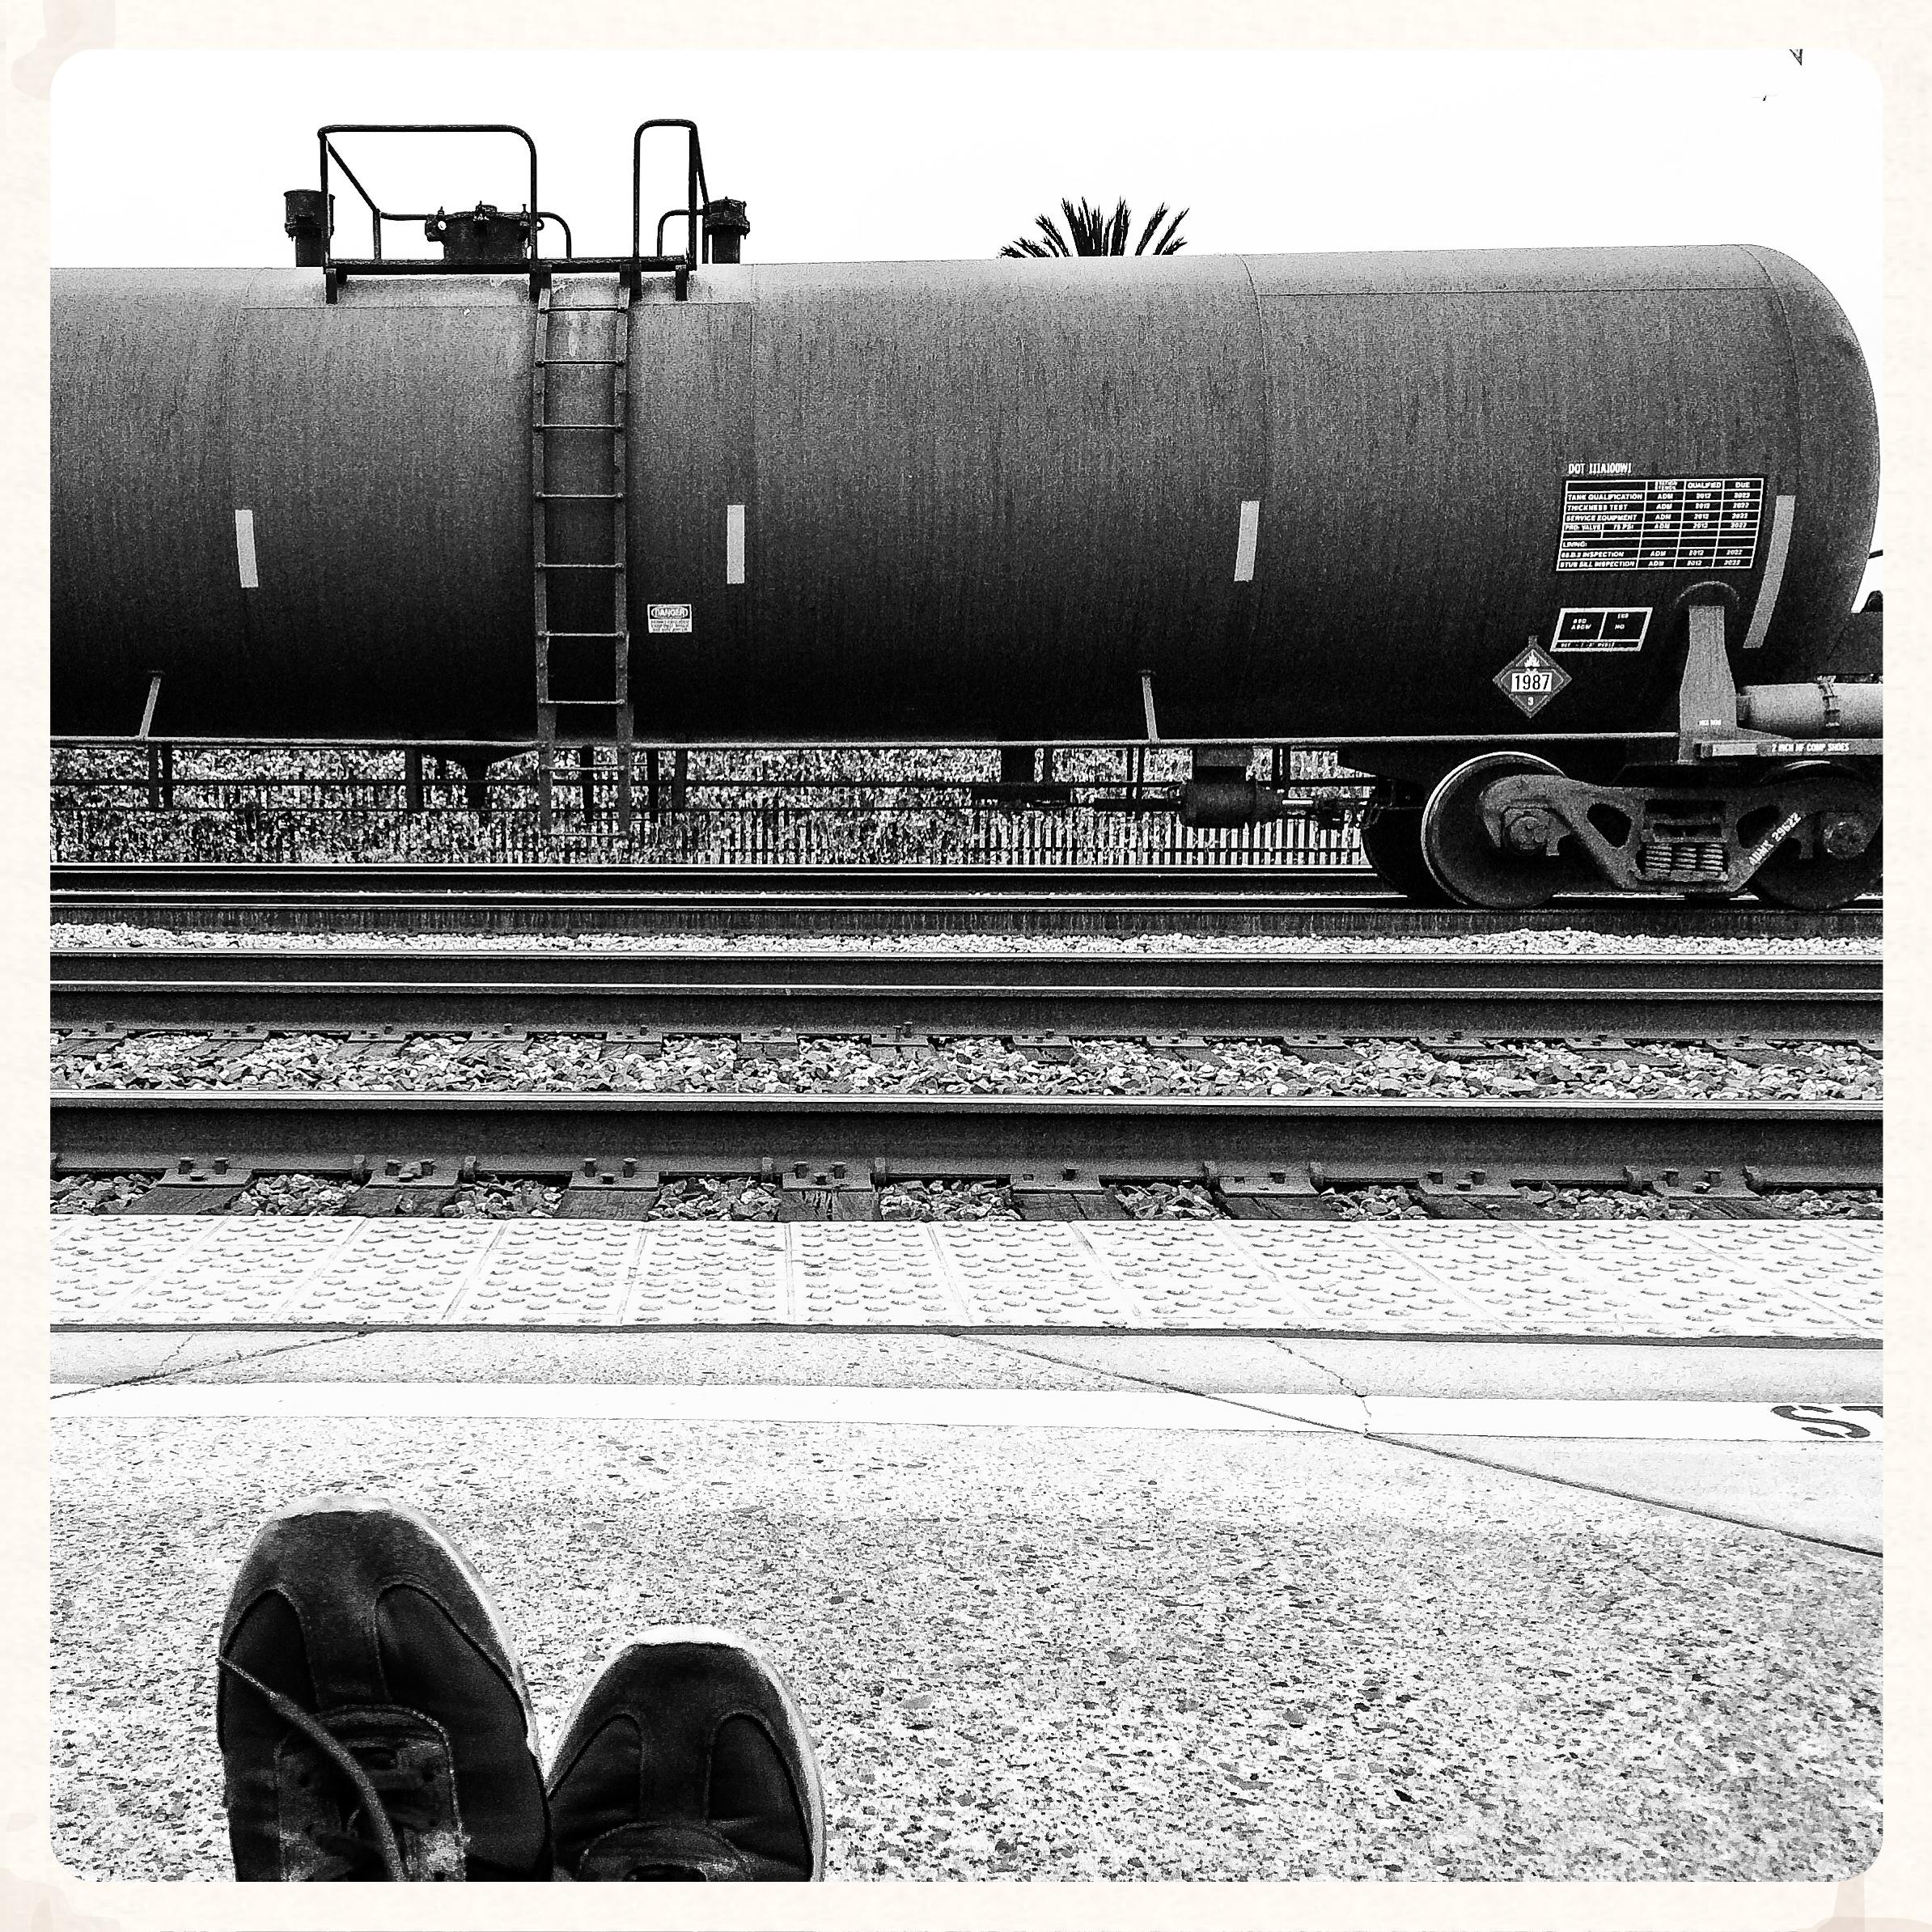 2013, Homeless and Amtraking.